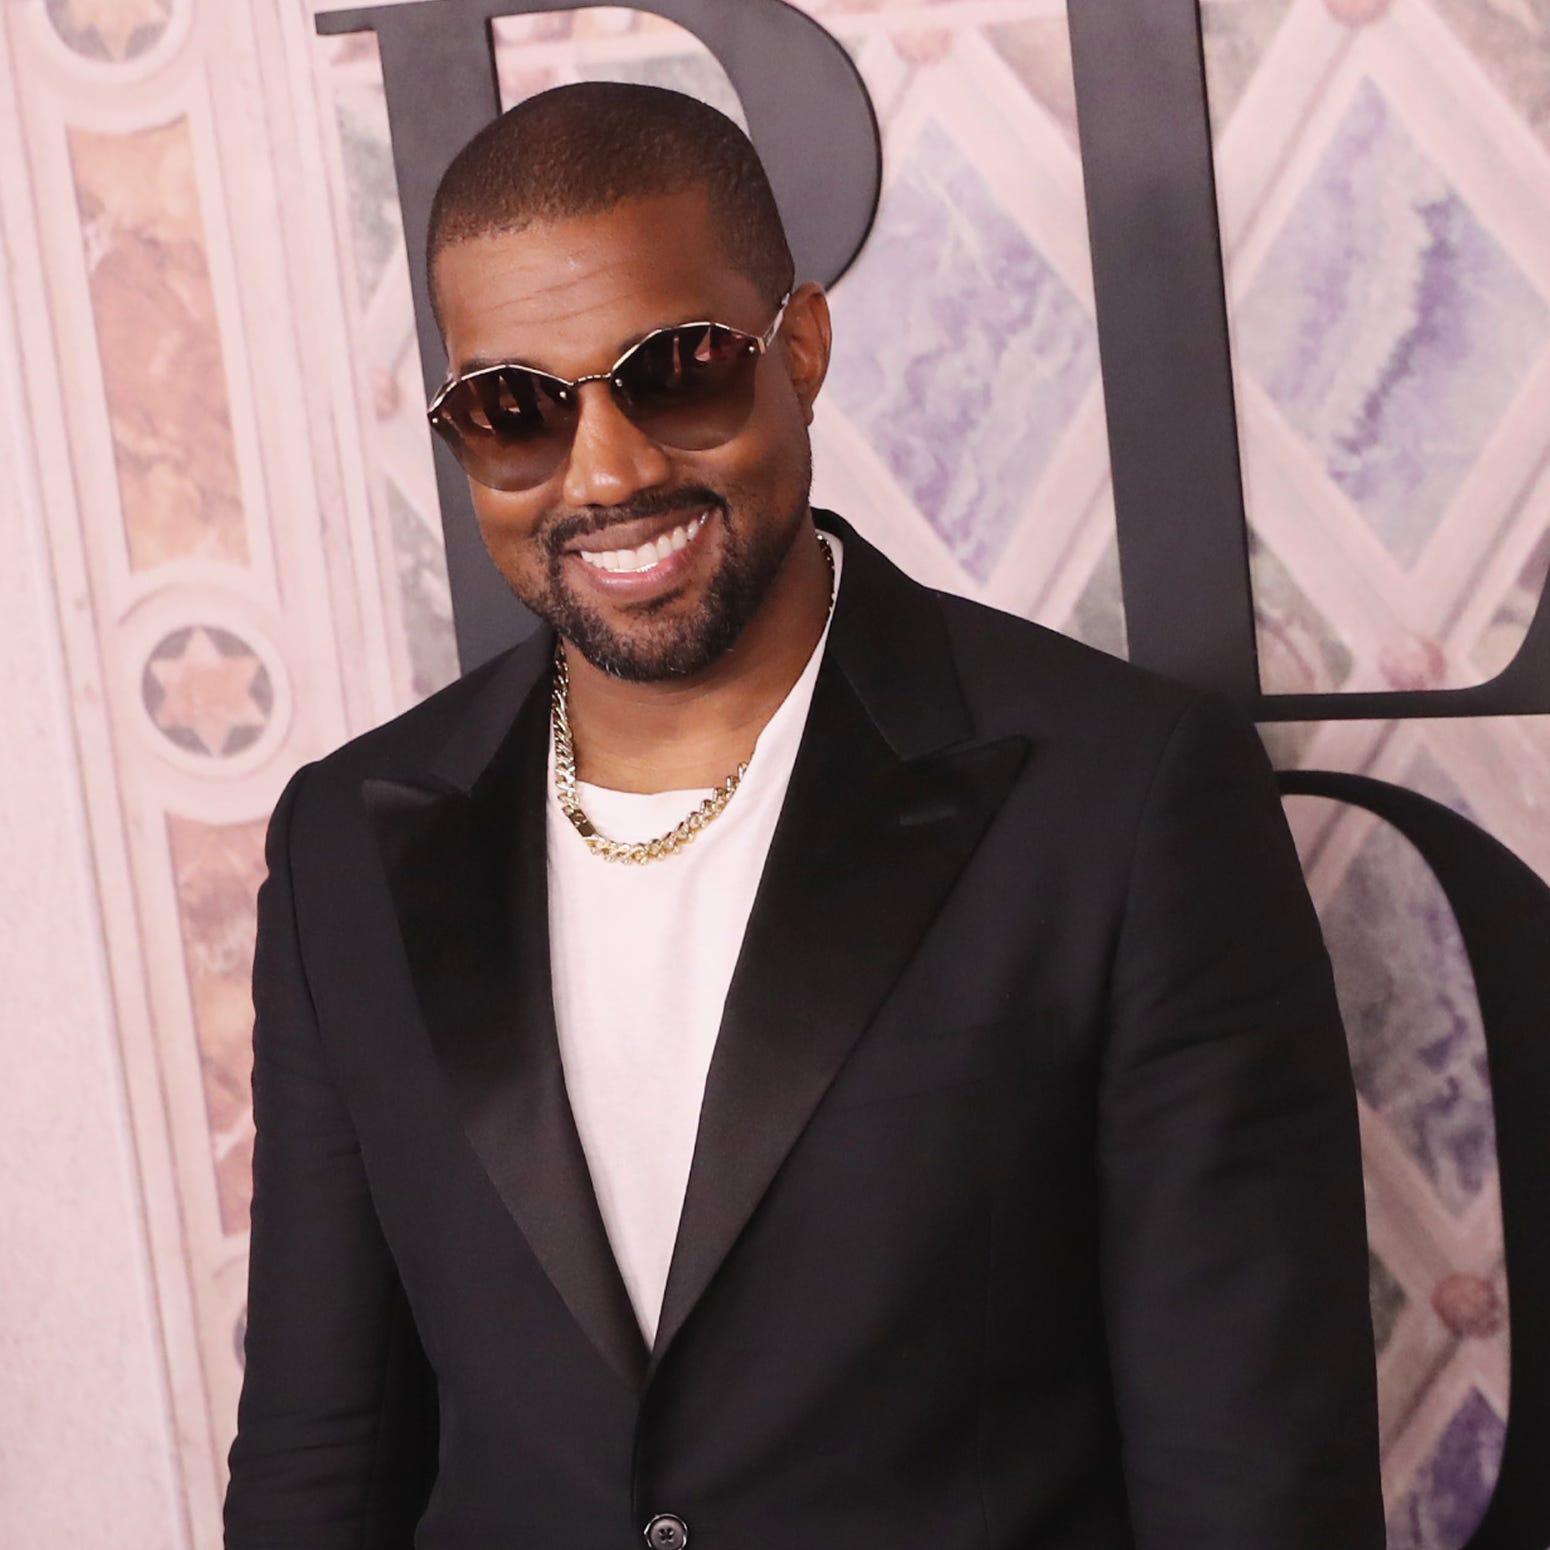 Mr. West